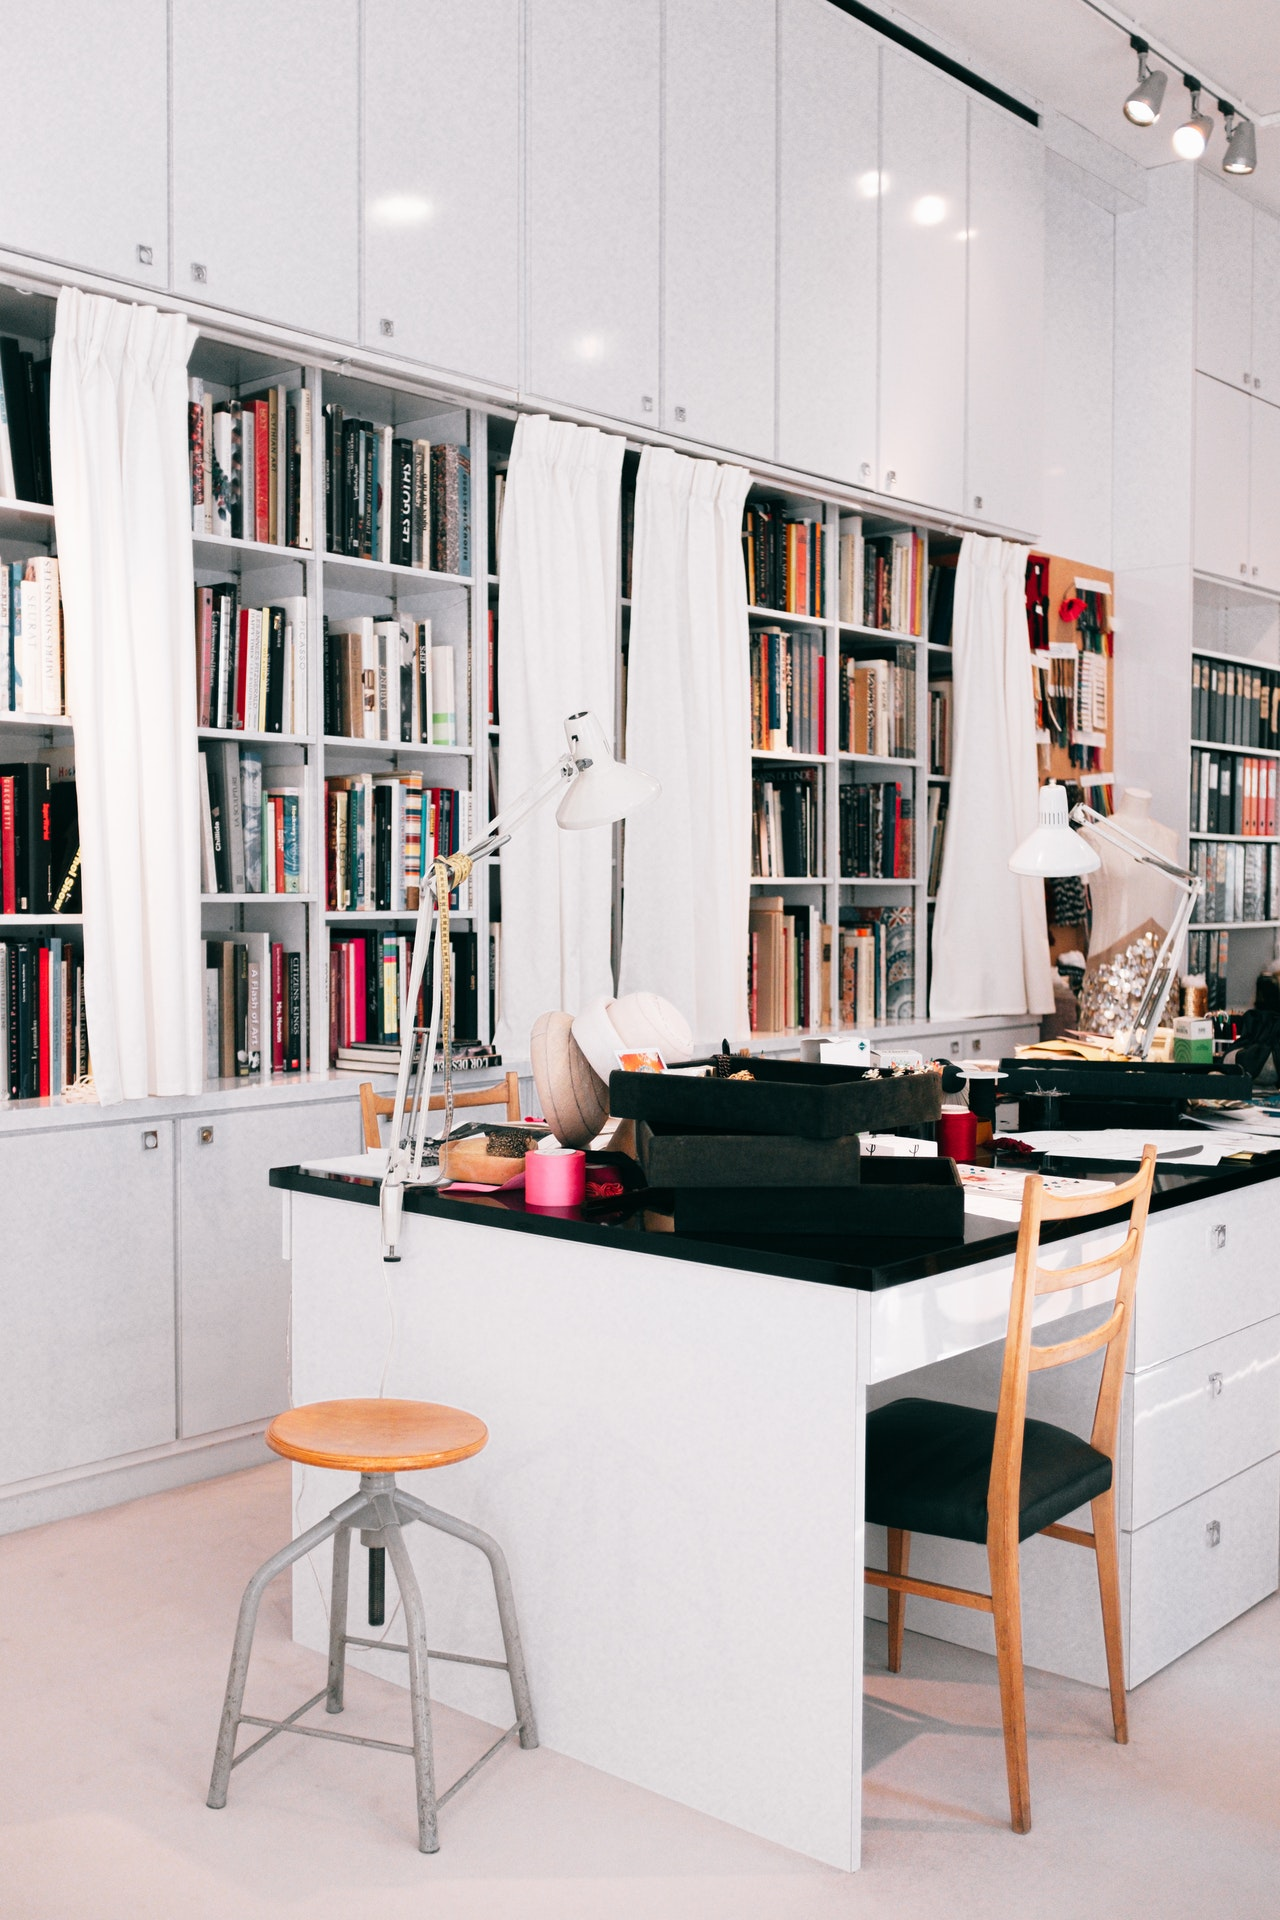 Bookshelf best design